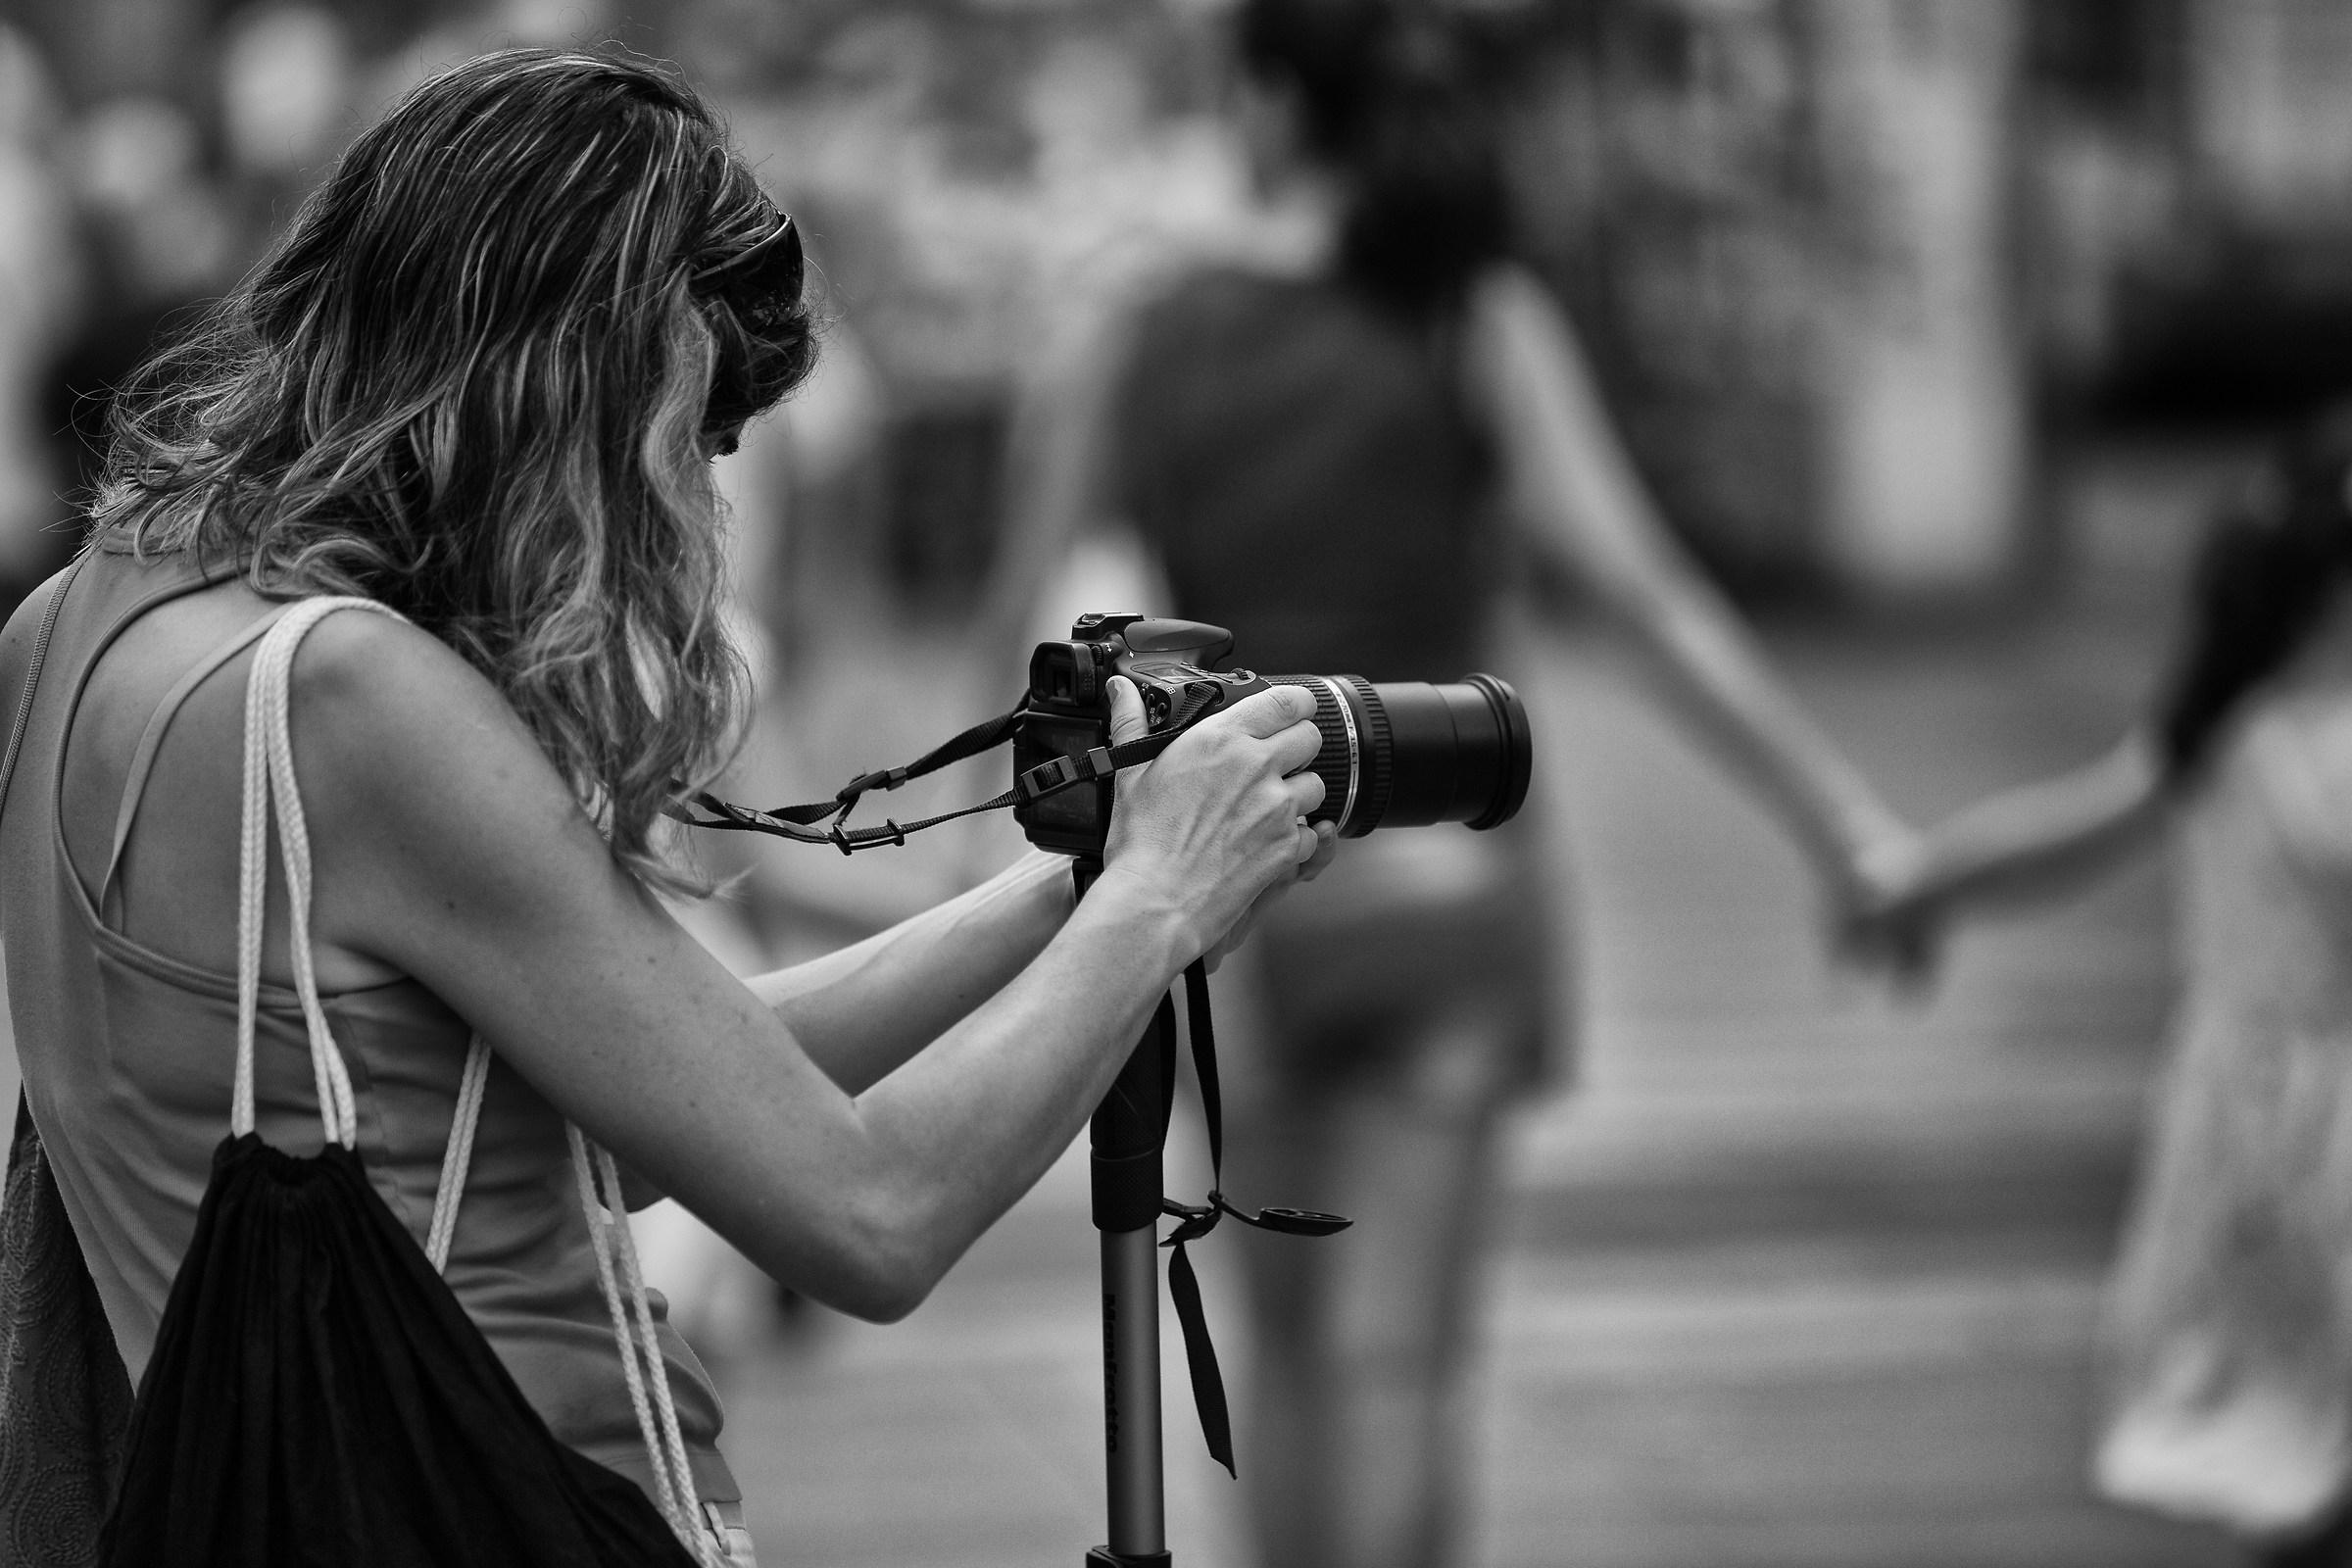 fotografa street...